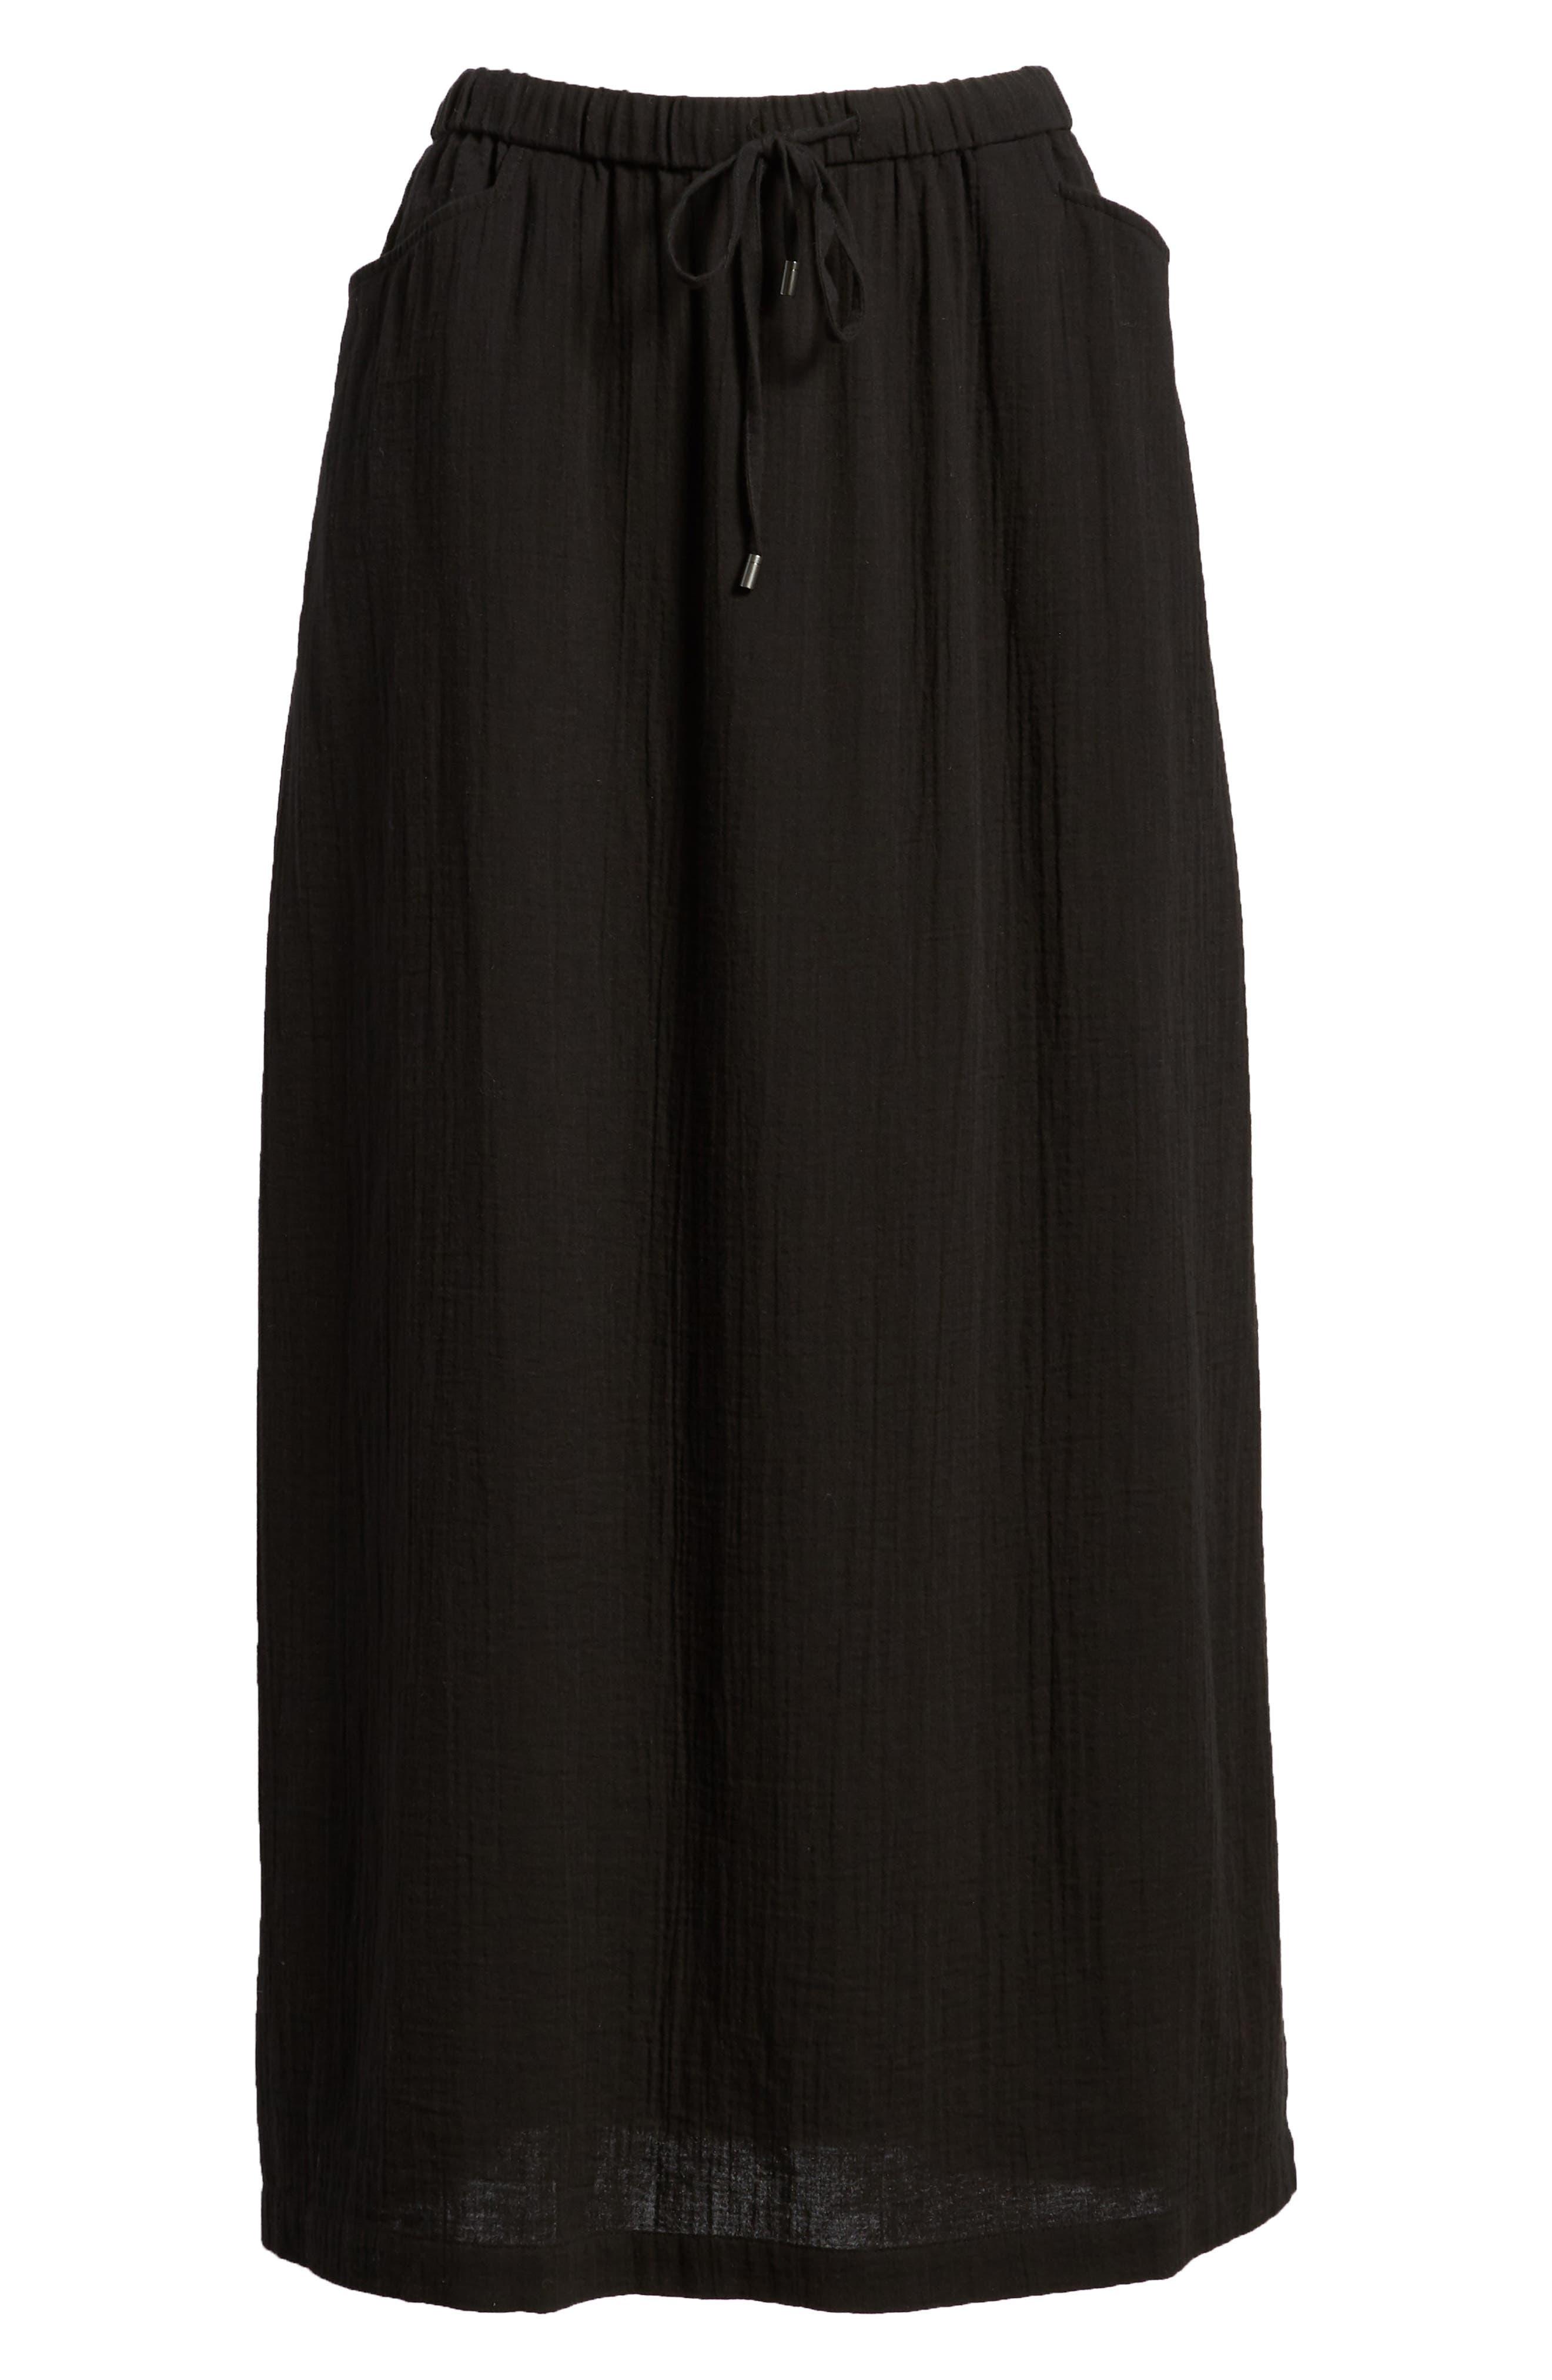 EILEEN FISHER,                             Drawstring Organic Cotton Midi Skirt,                             Alternate thumbnail 6, color,                             001